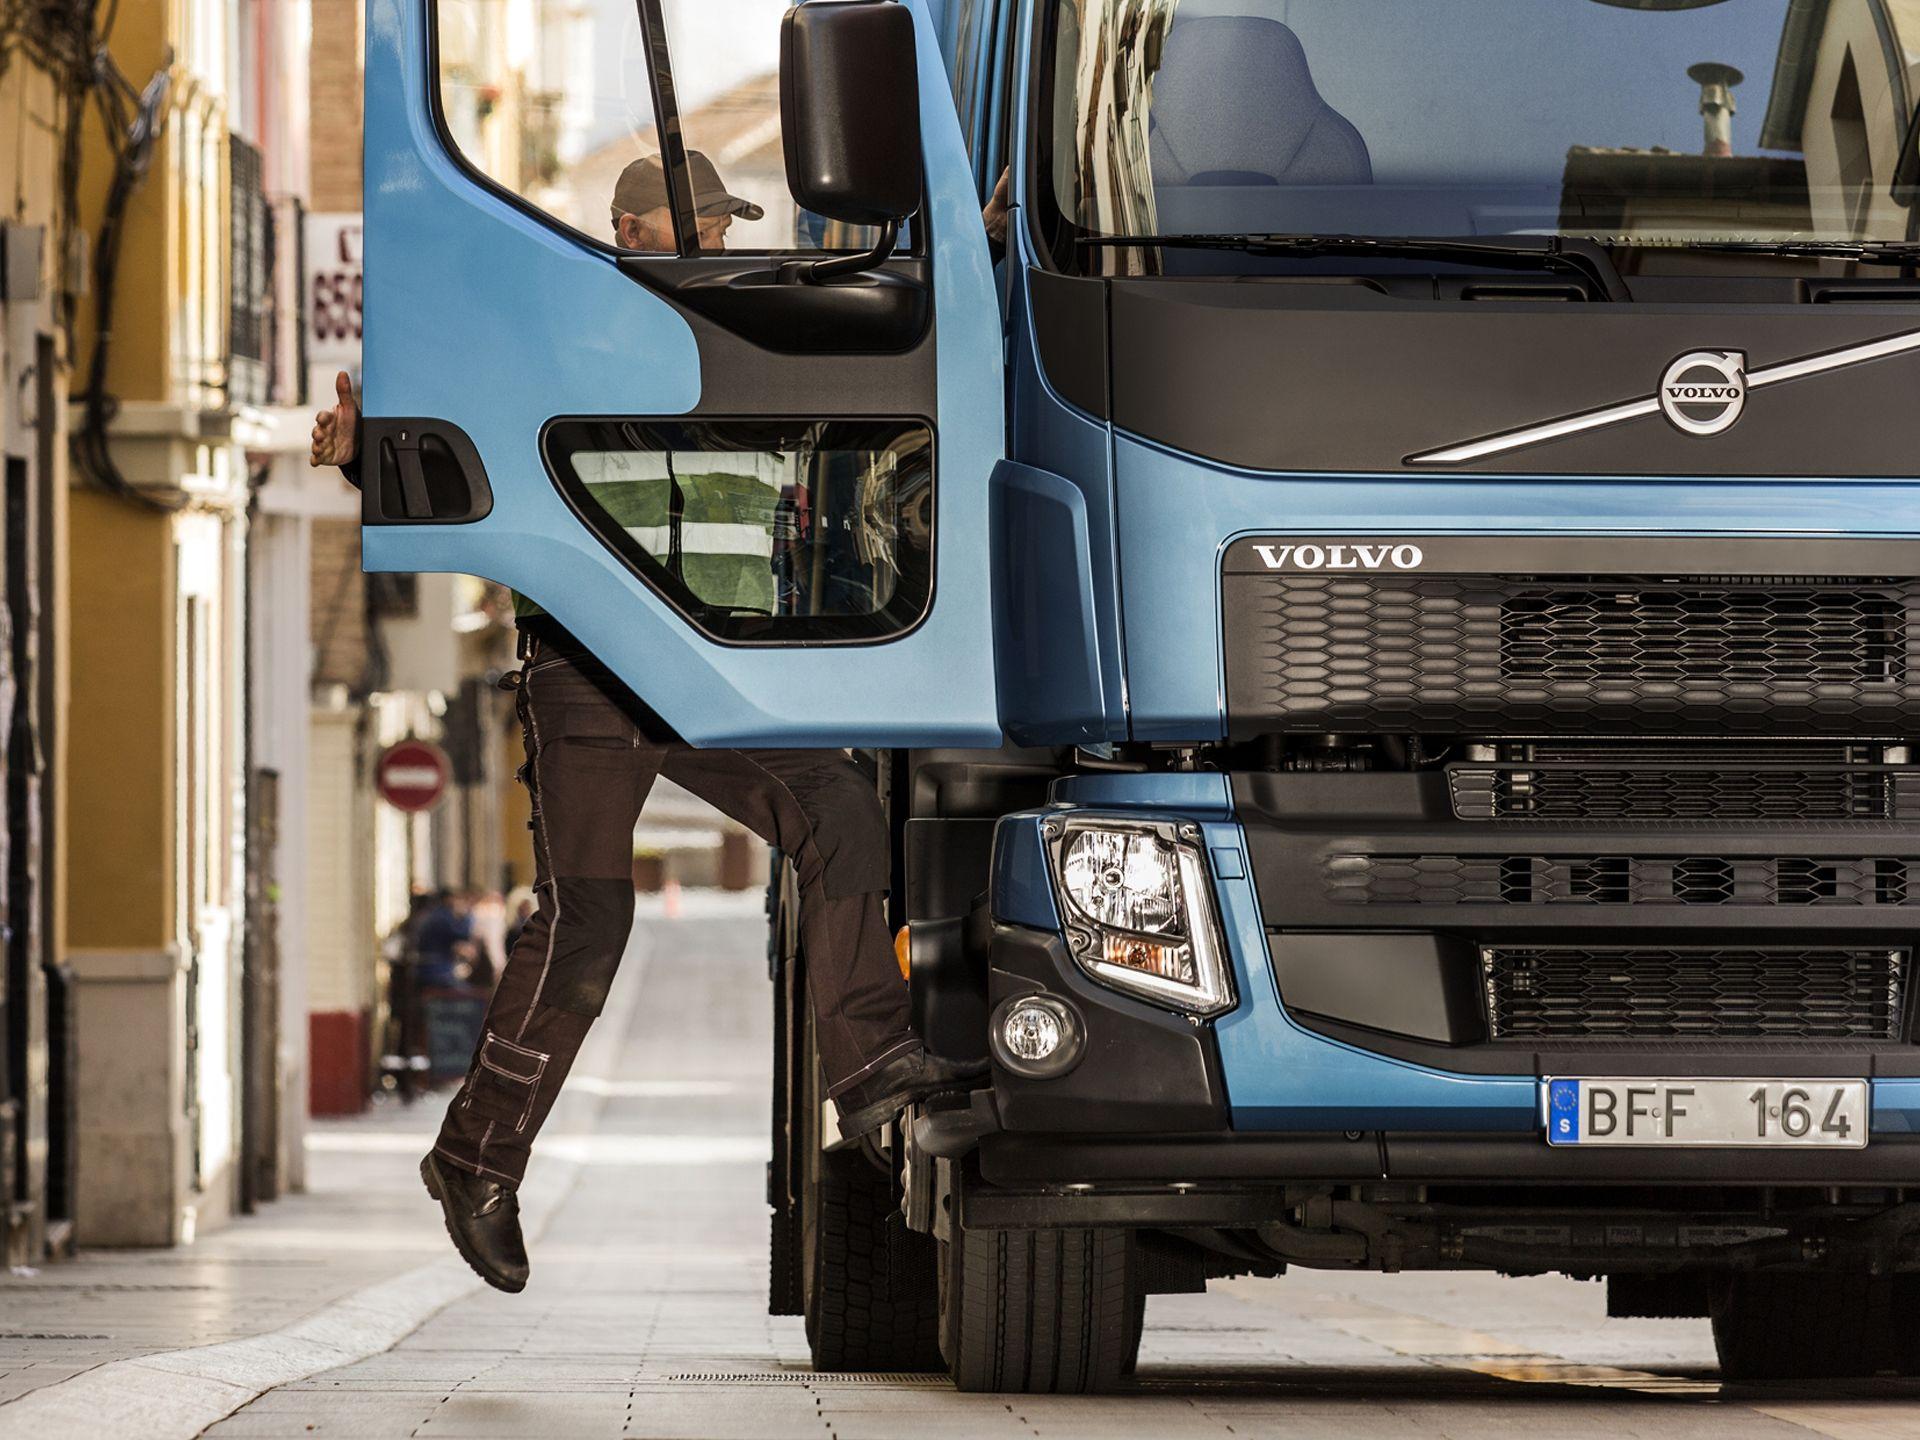 Volvo FE – Entry Step, A Smart Step Up